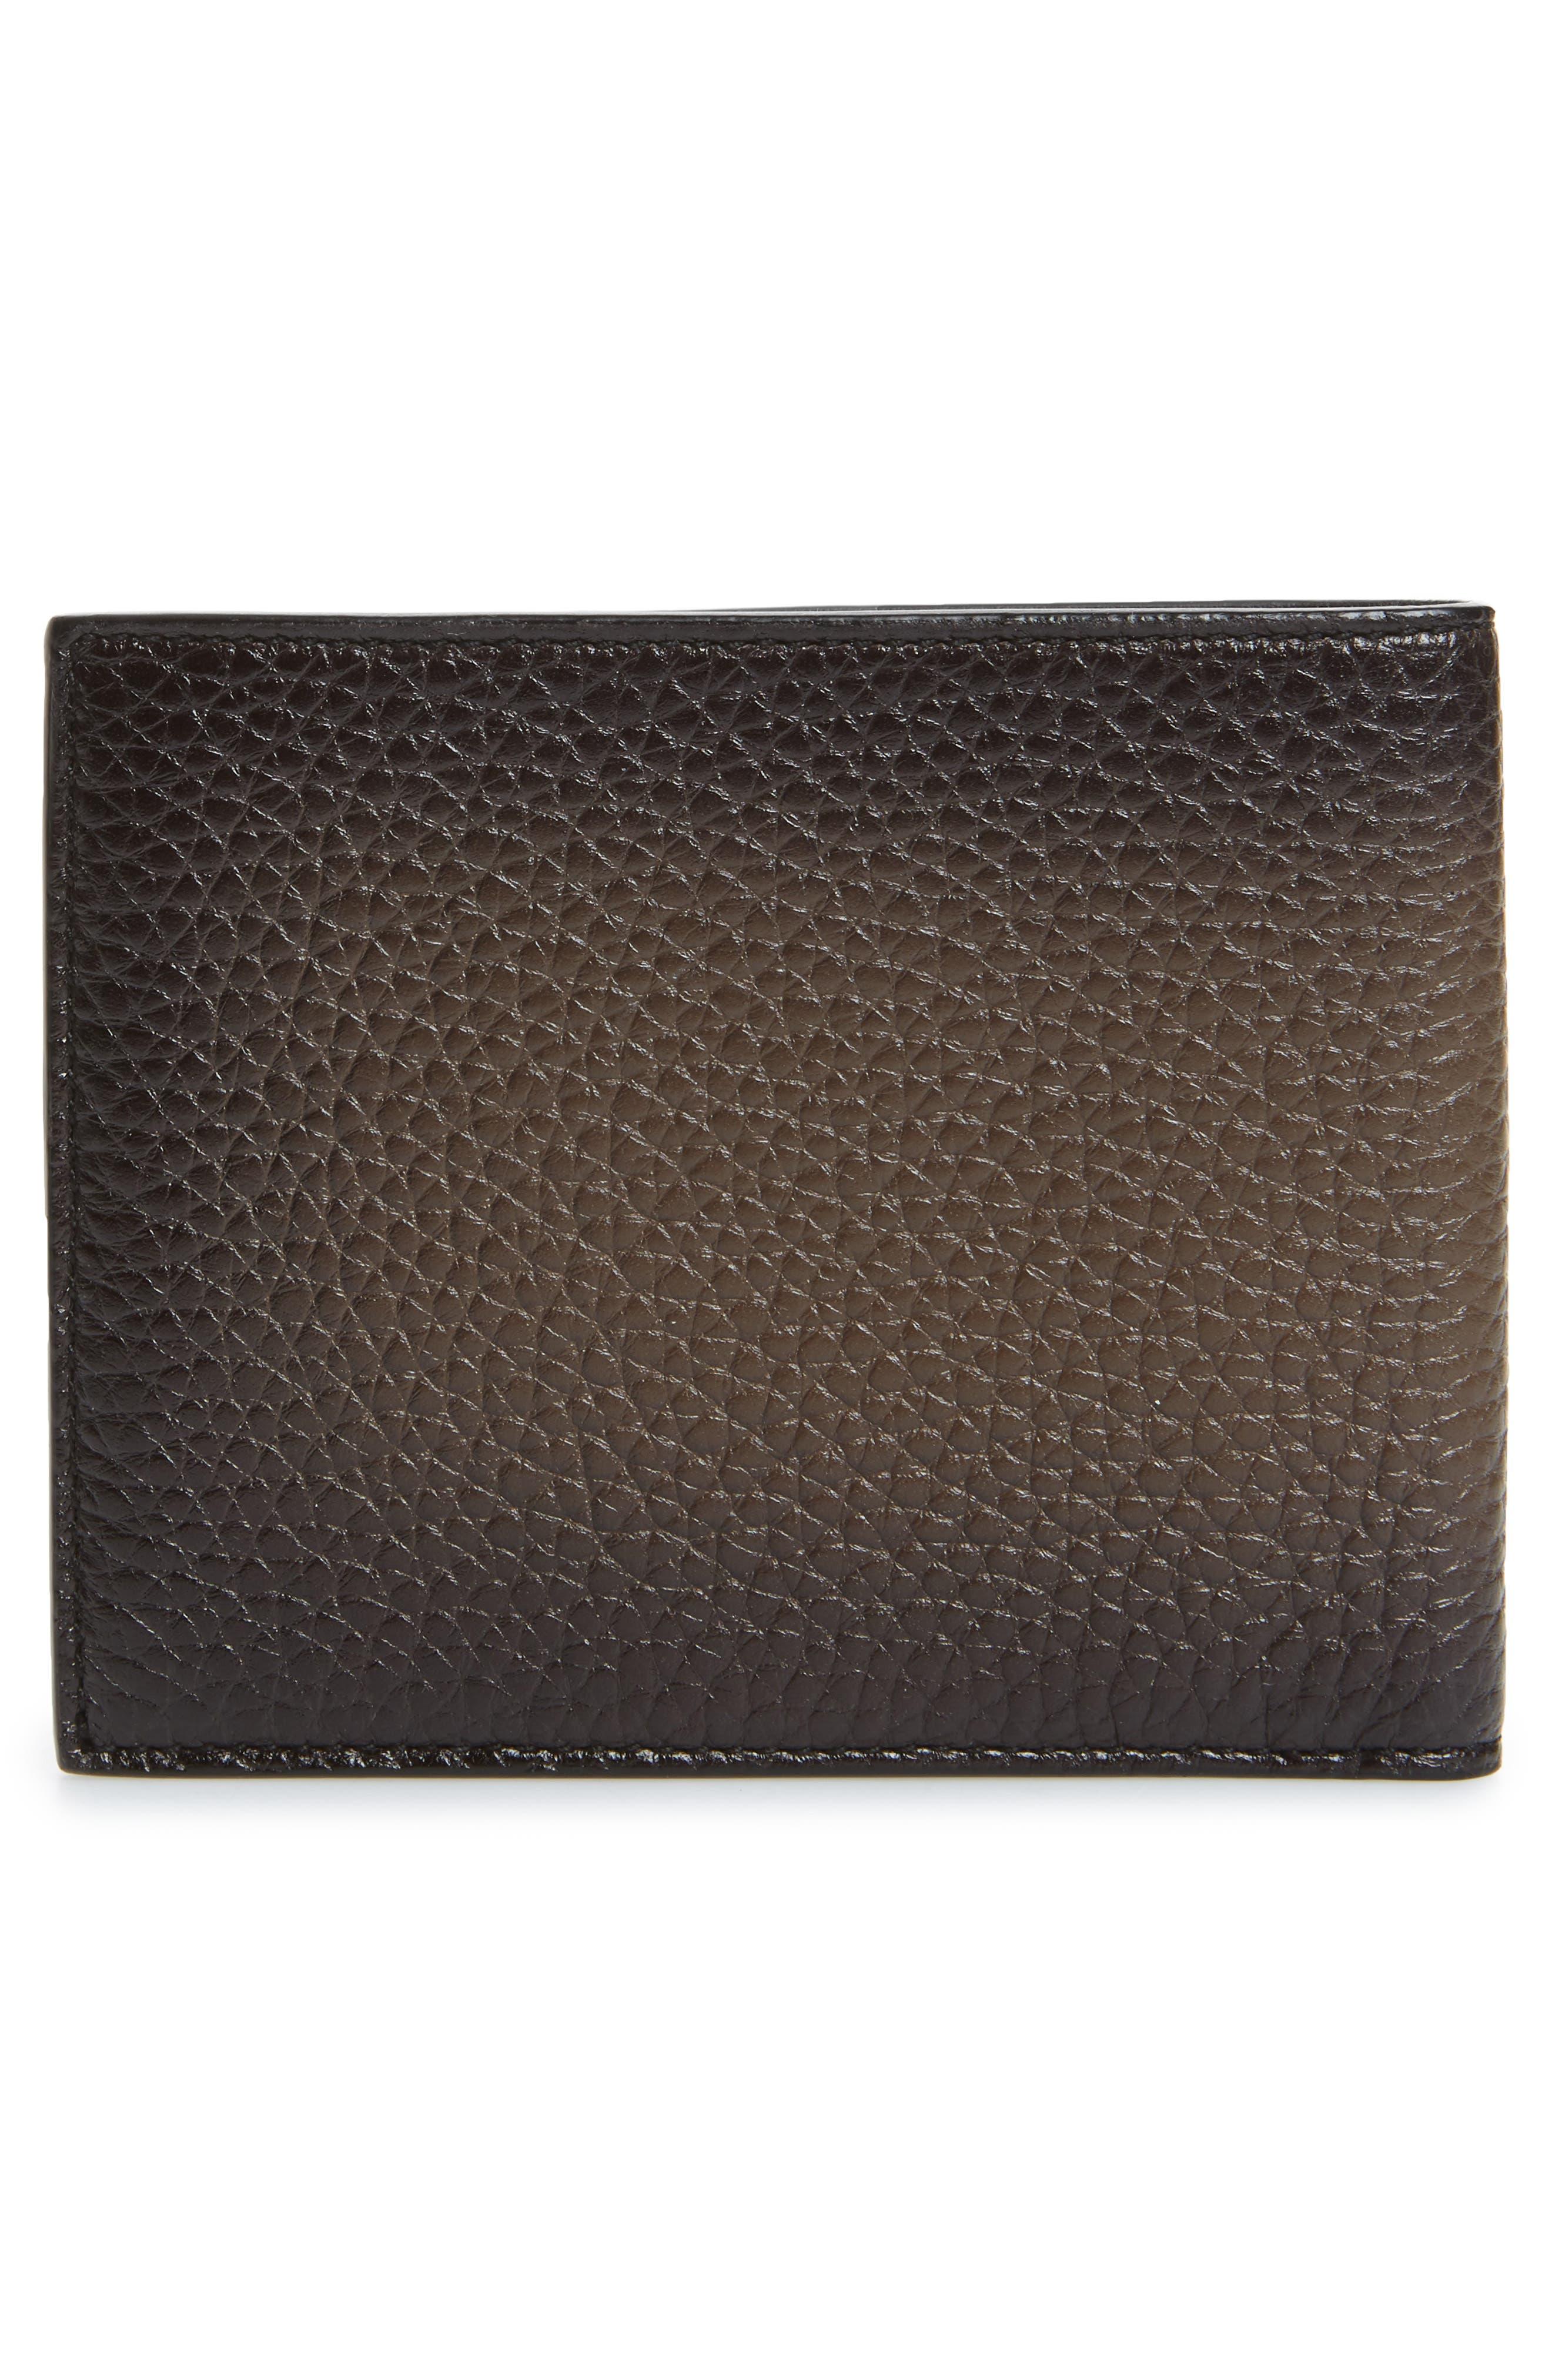 Alternate Image 3  - Salvatore Ferragamo Glow Leather Wallet